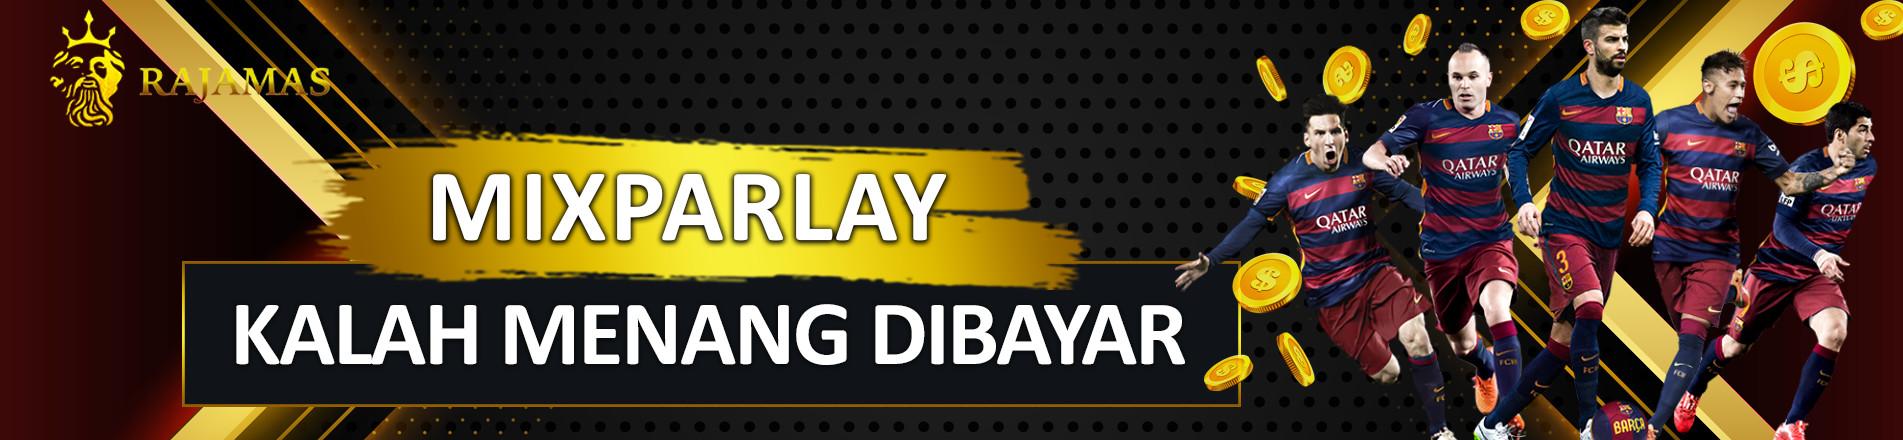 Default Main Banner 6